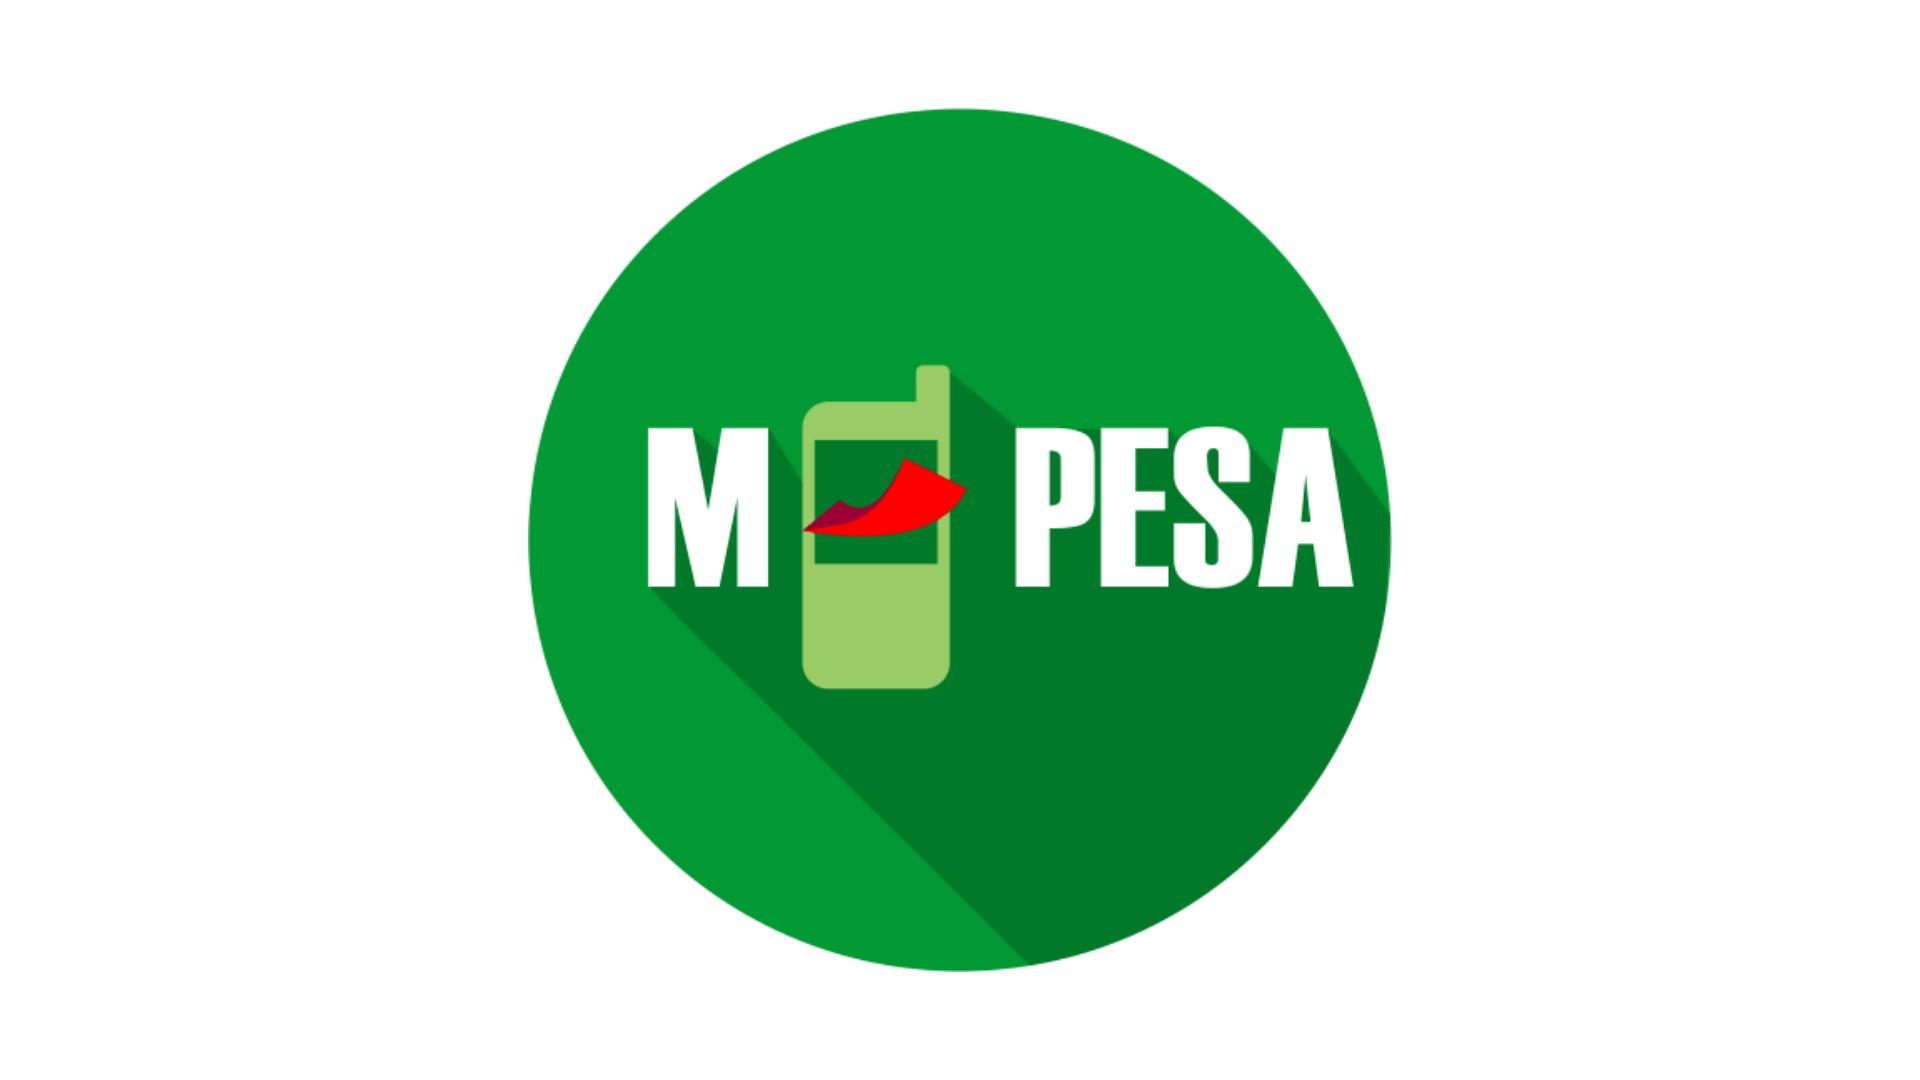 Over 200,000 Businesses Join Safaricom's Lipa Na M-PESA Service - Kenyan Wallstreet